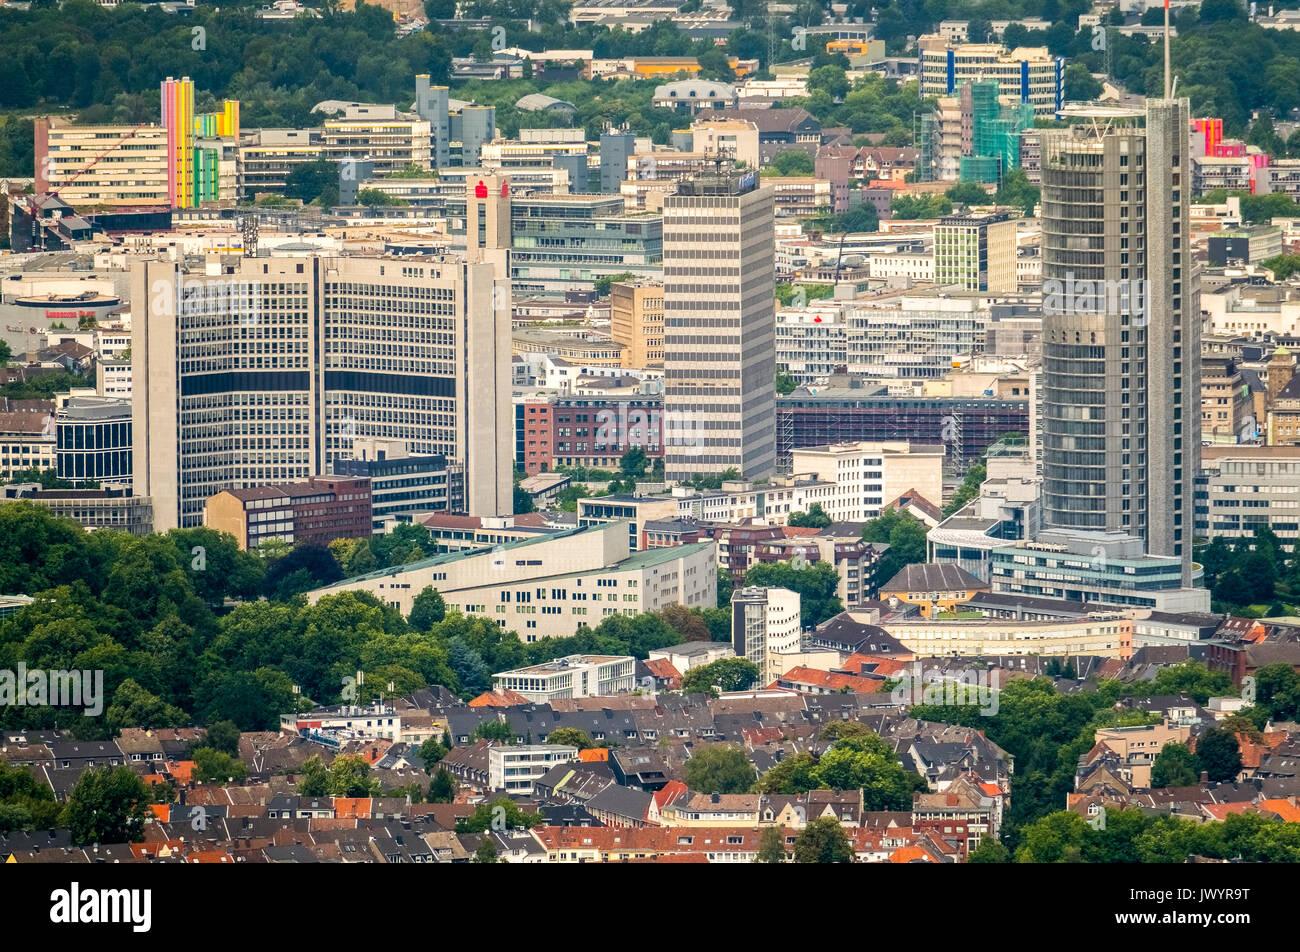 RWE-Tower, Aalto-Theater, Philharmonie Essen, Postbank Immobilien GmbH, Postbank Hochhaus, RWE Systems AG, skyscrapers, skyline of Essen, Essen, Ruhr  - Stock Image